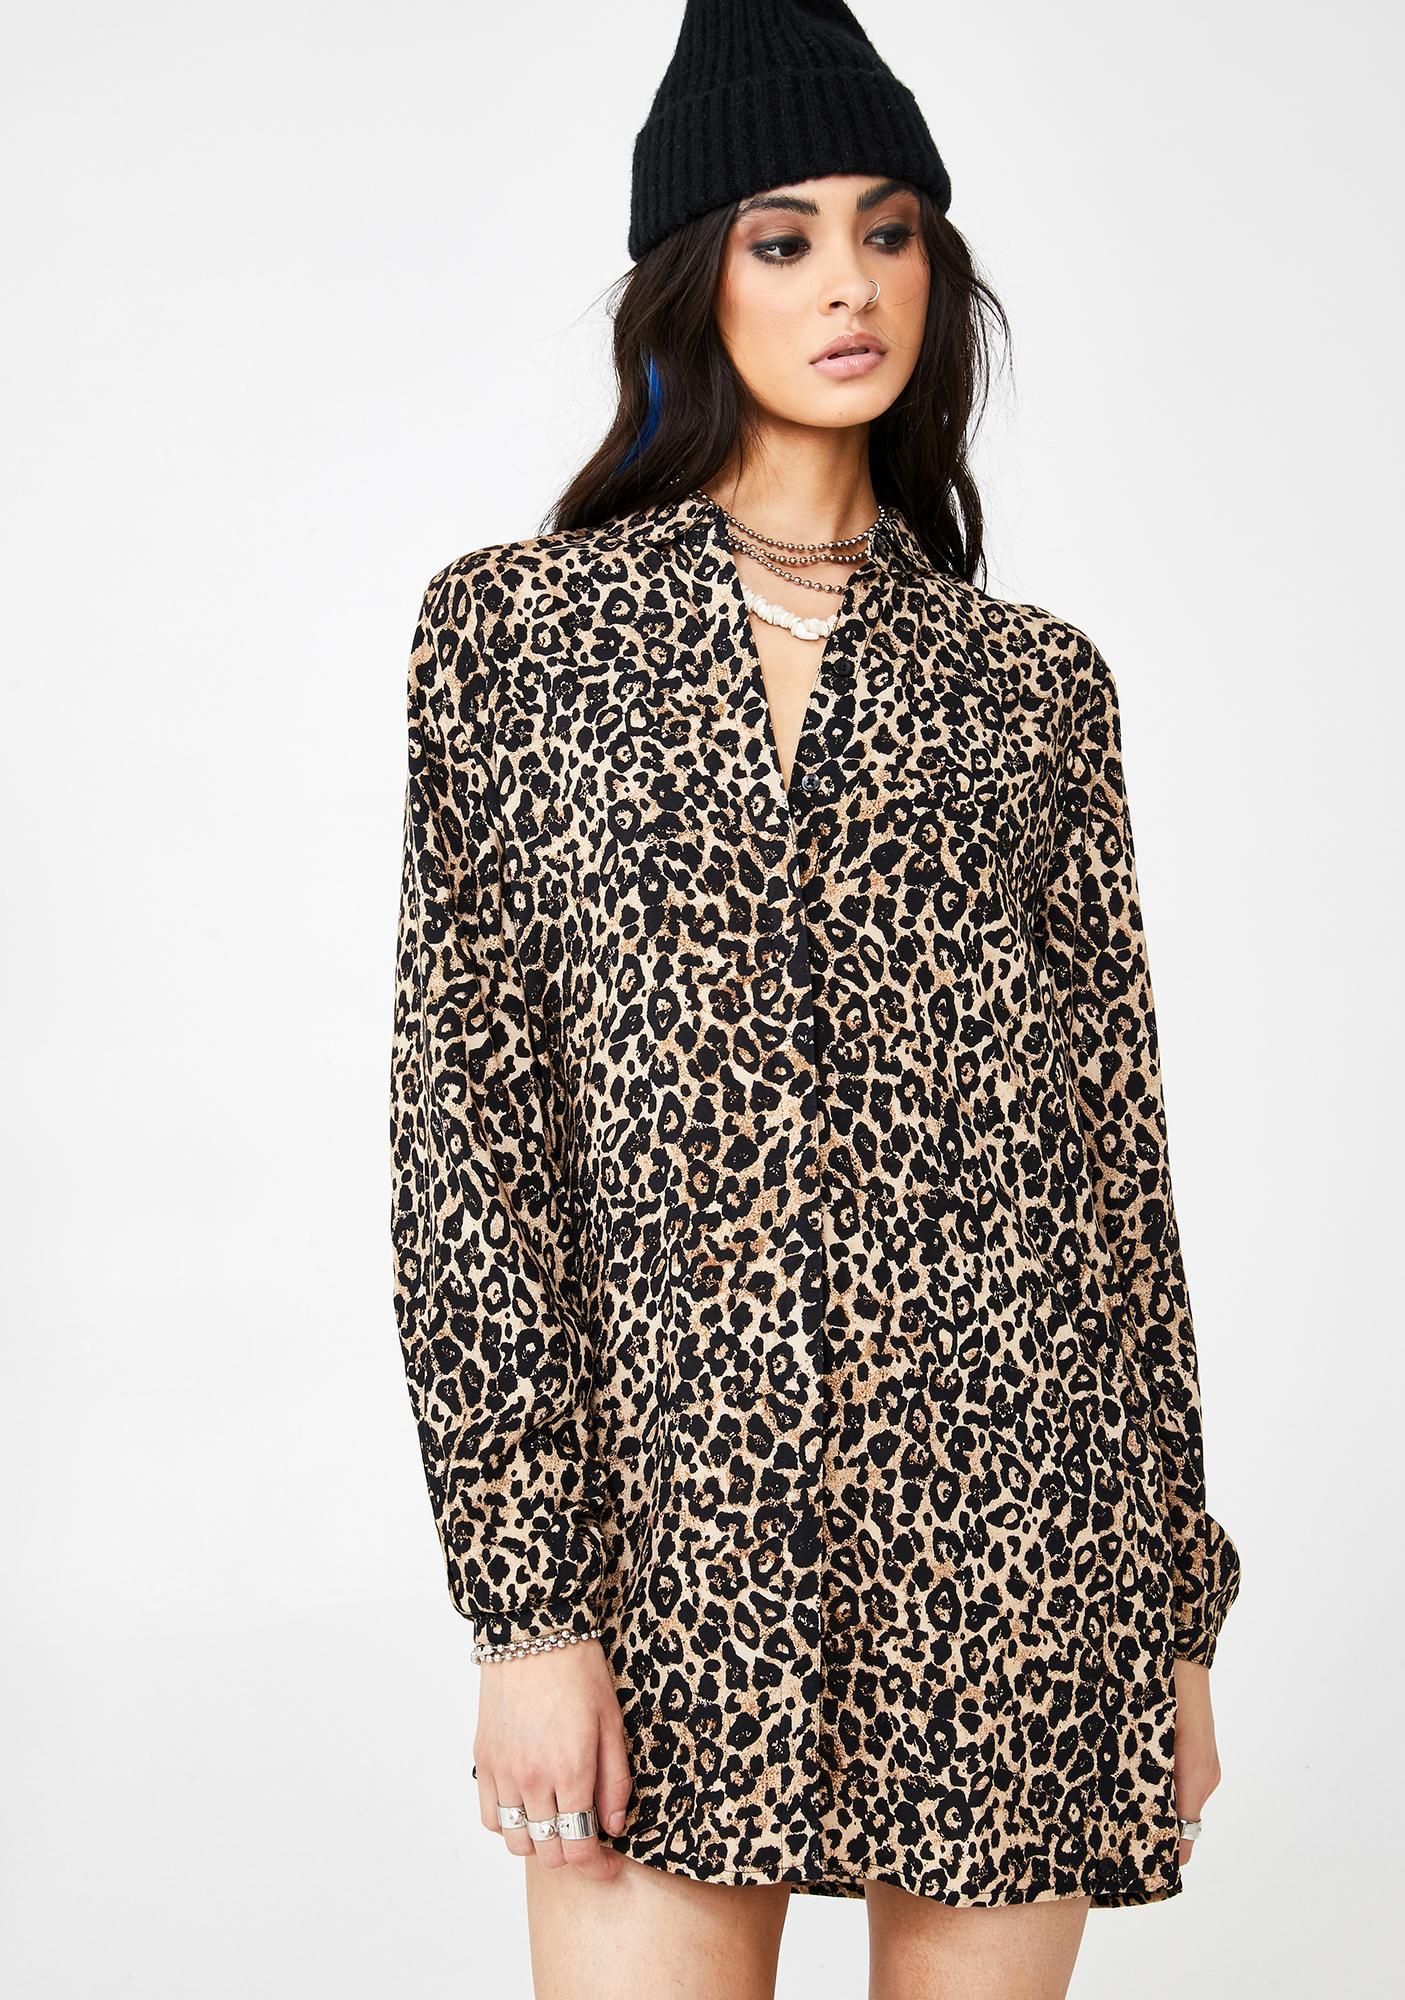 Volcom Fad Friend Leopard Button Down